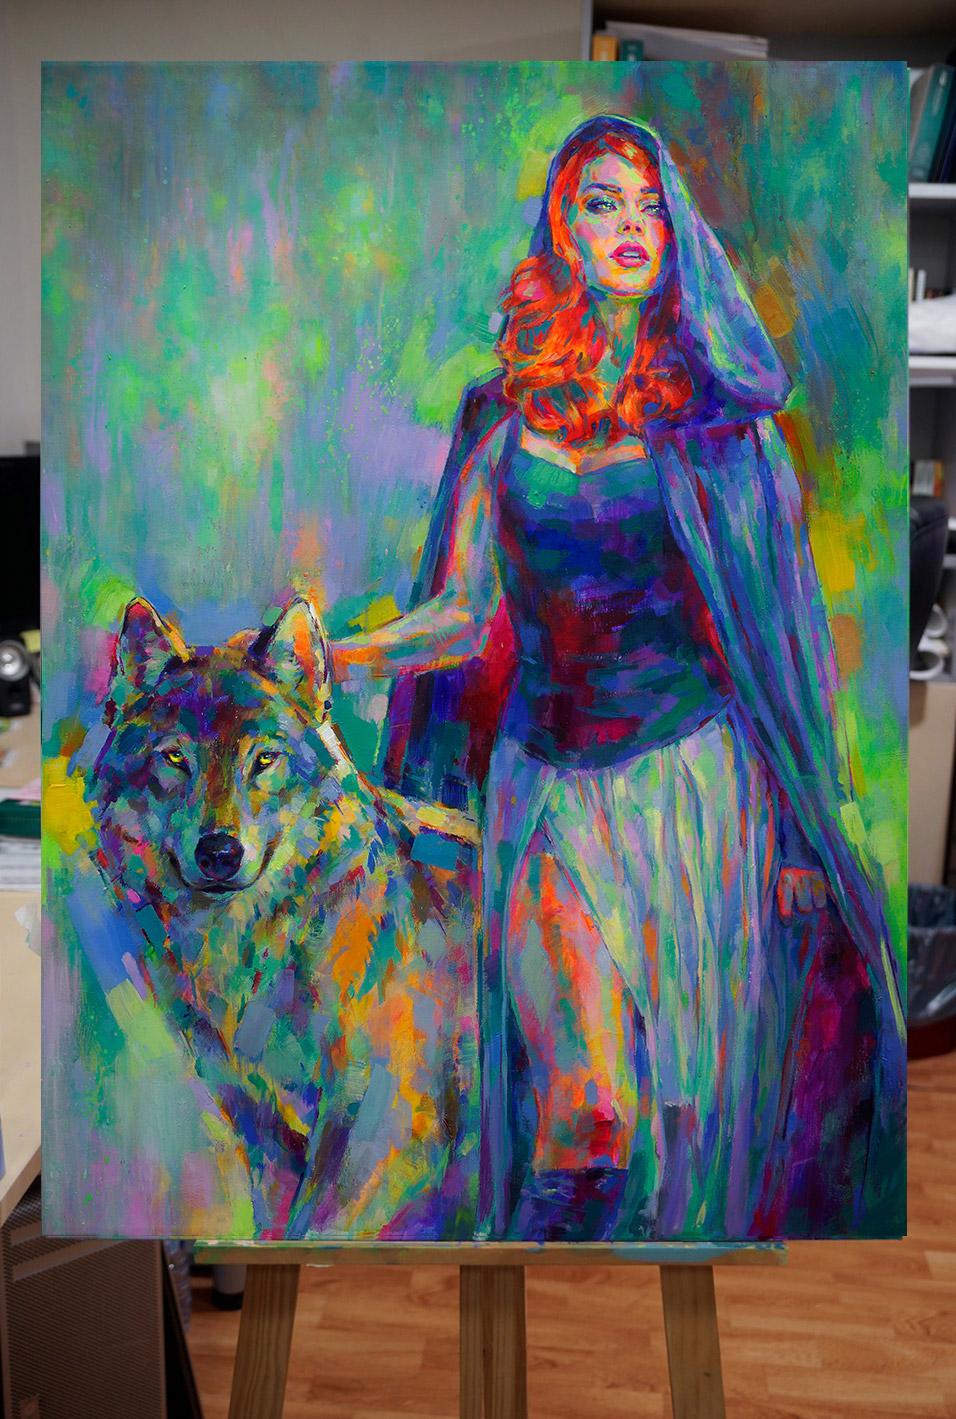 Blue Riding Hood